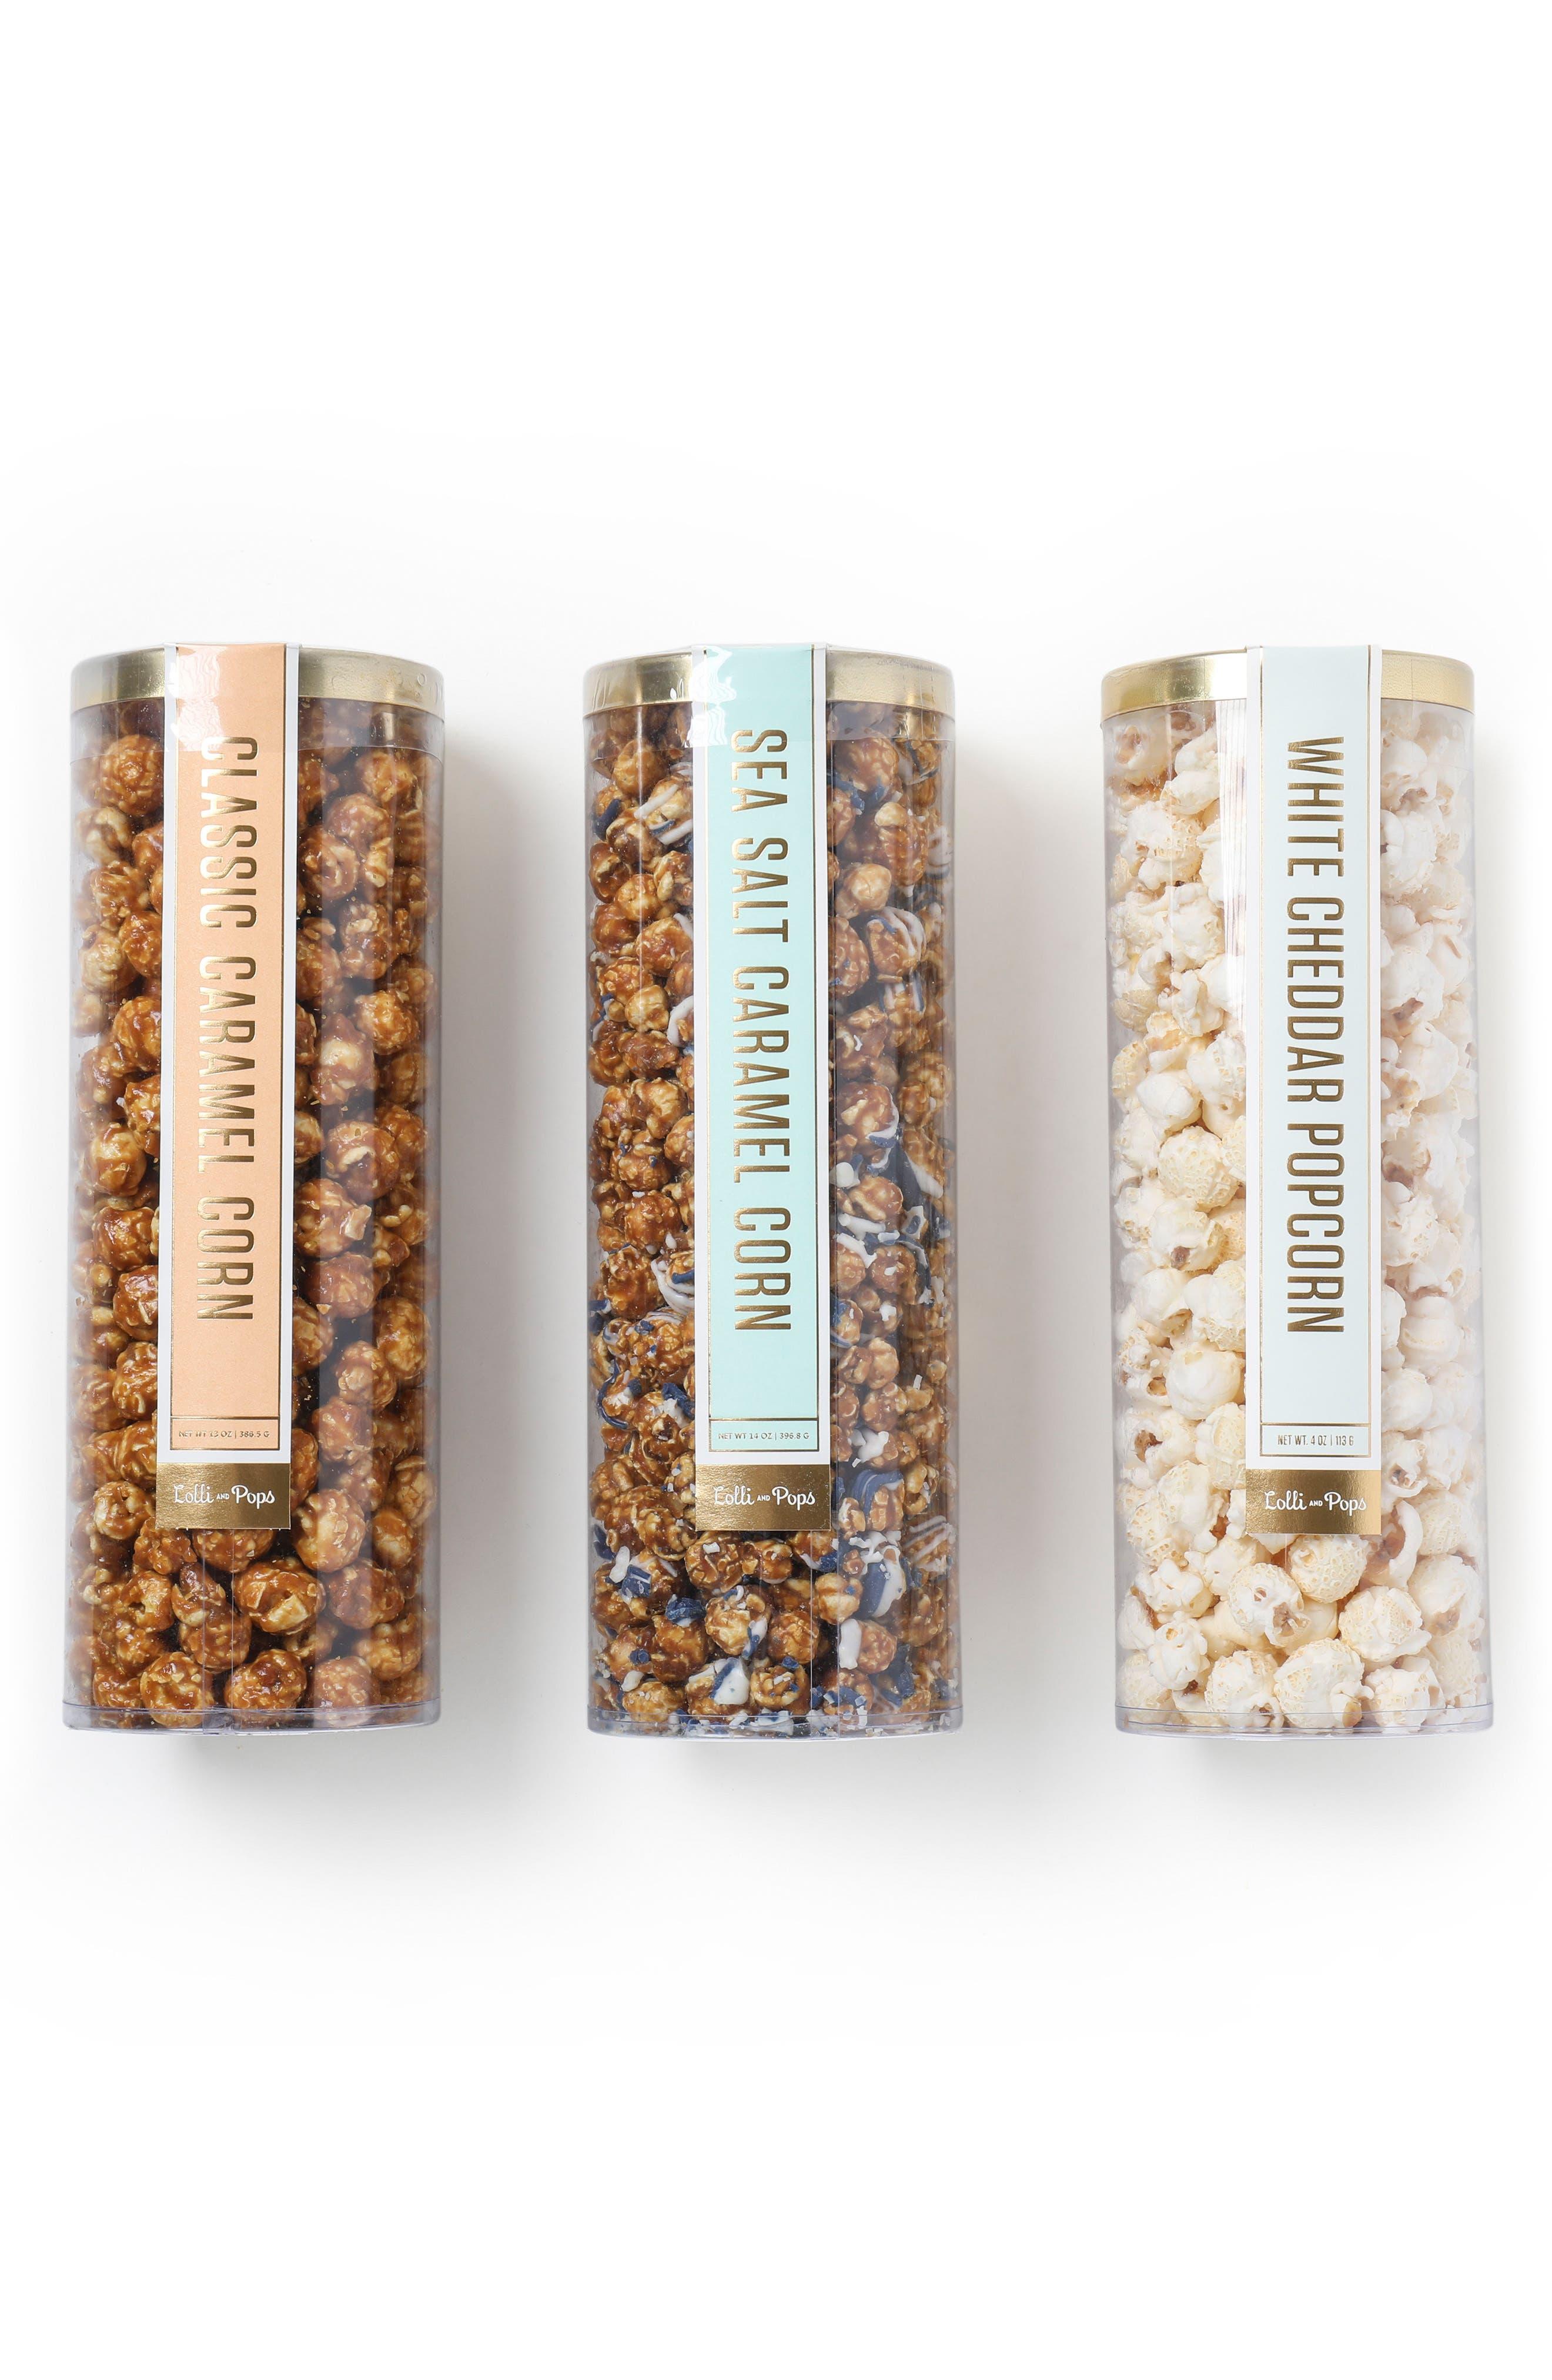 Main Image - Lolli and Pops Set of 3 Popcorn Tubes